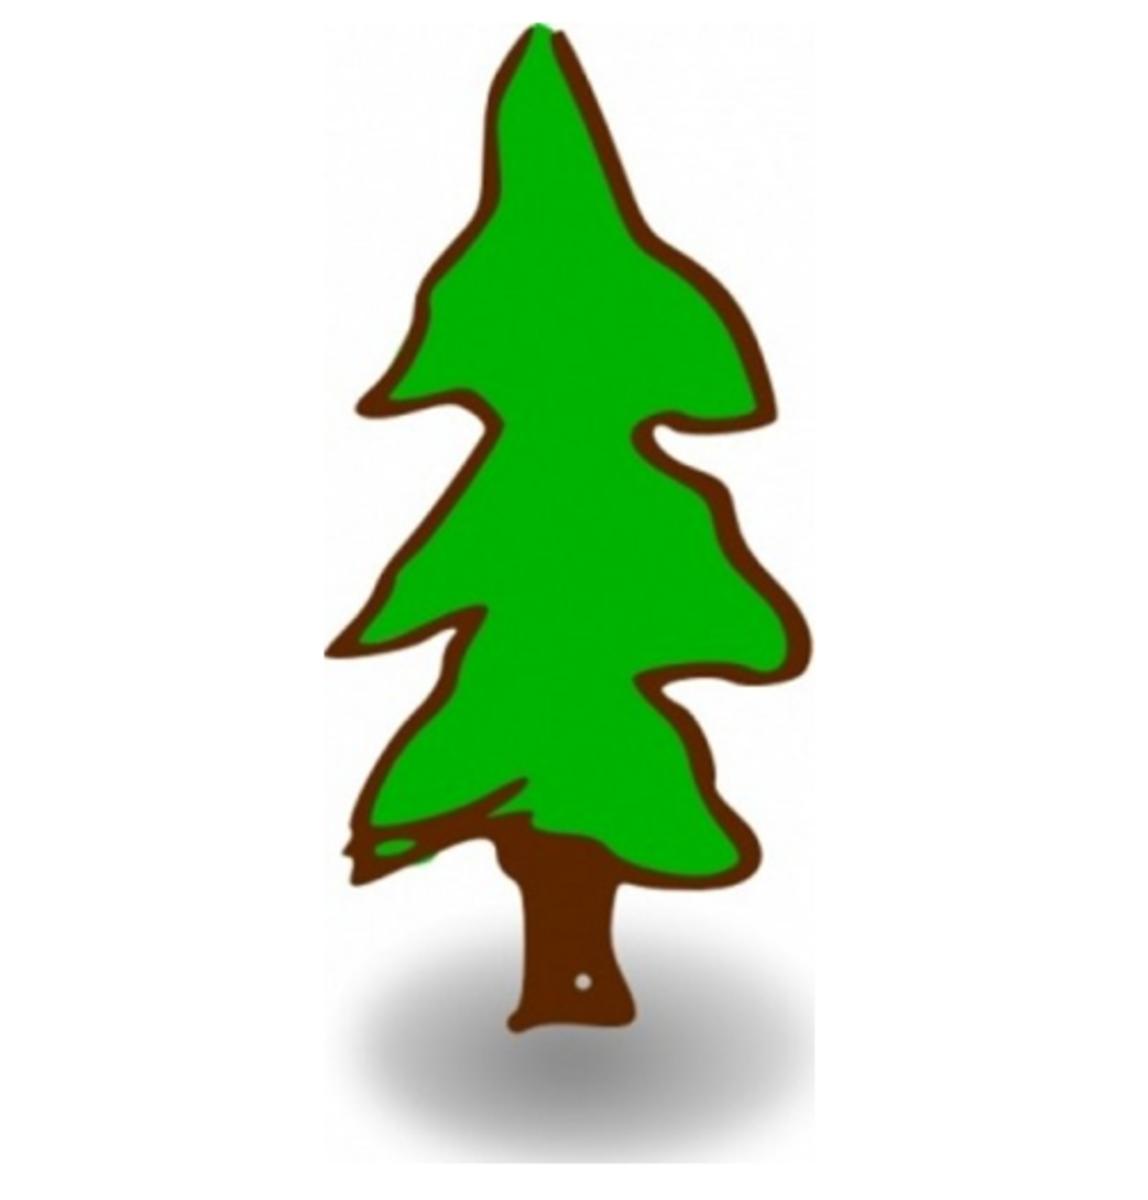 Fir Tree Graphic